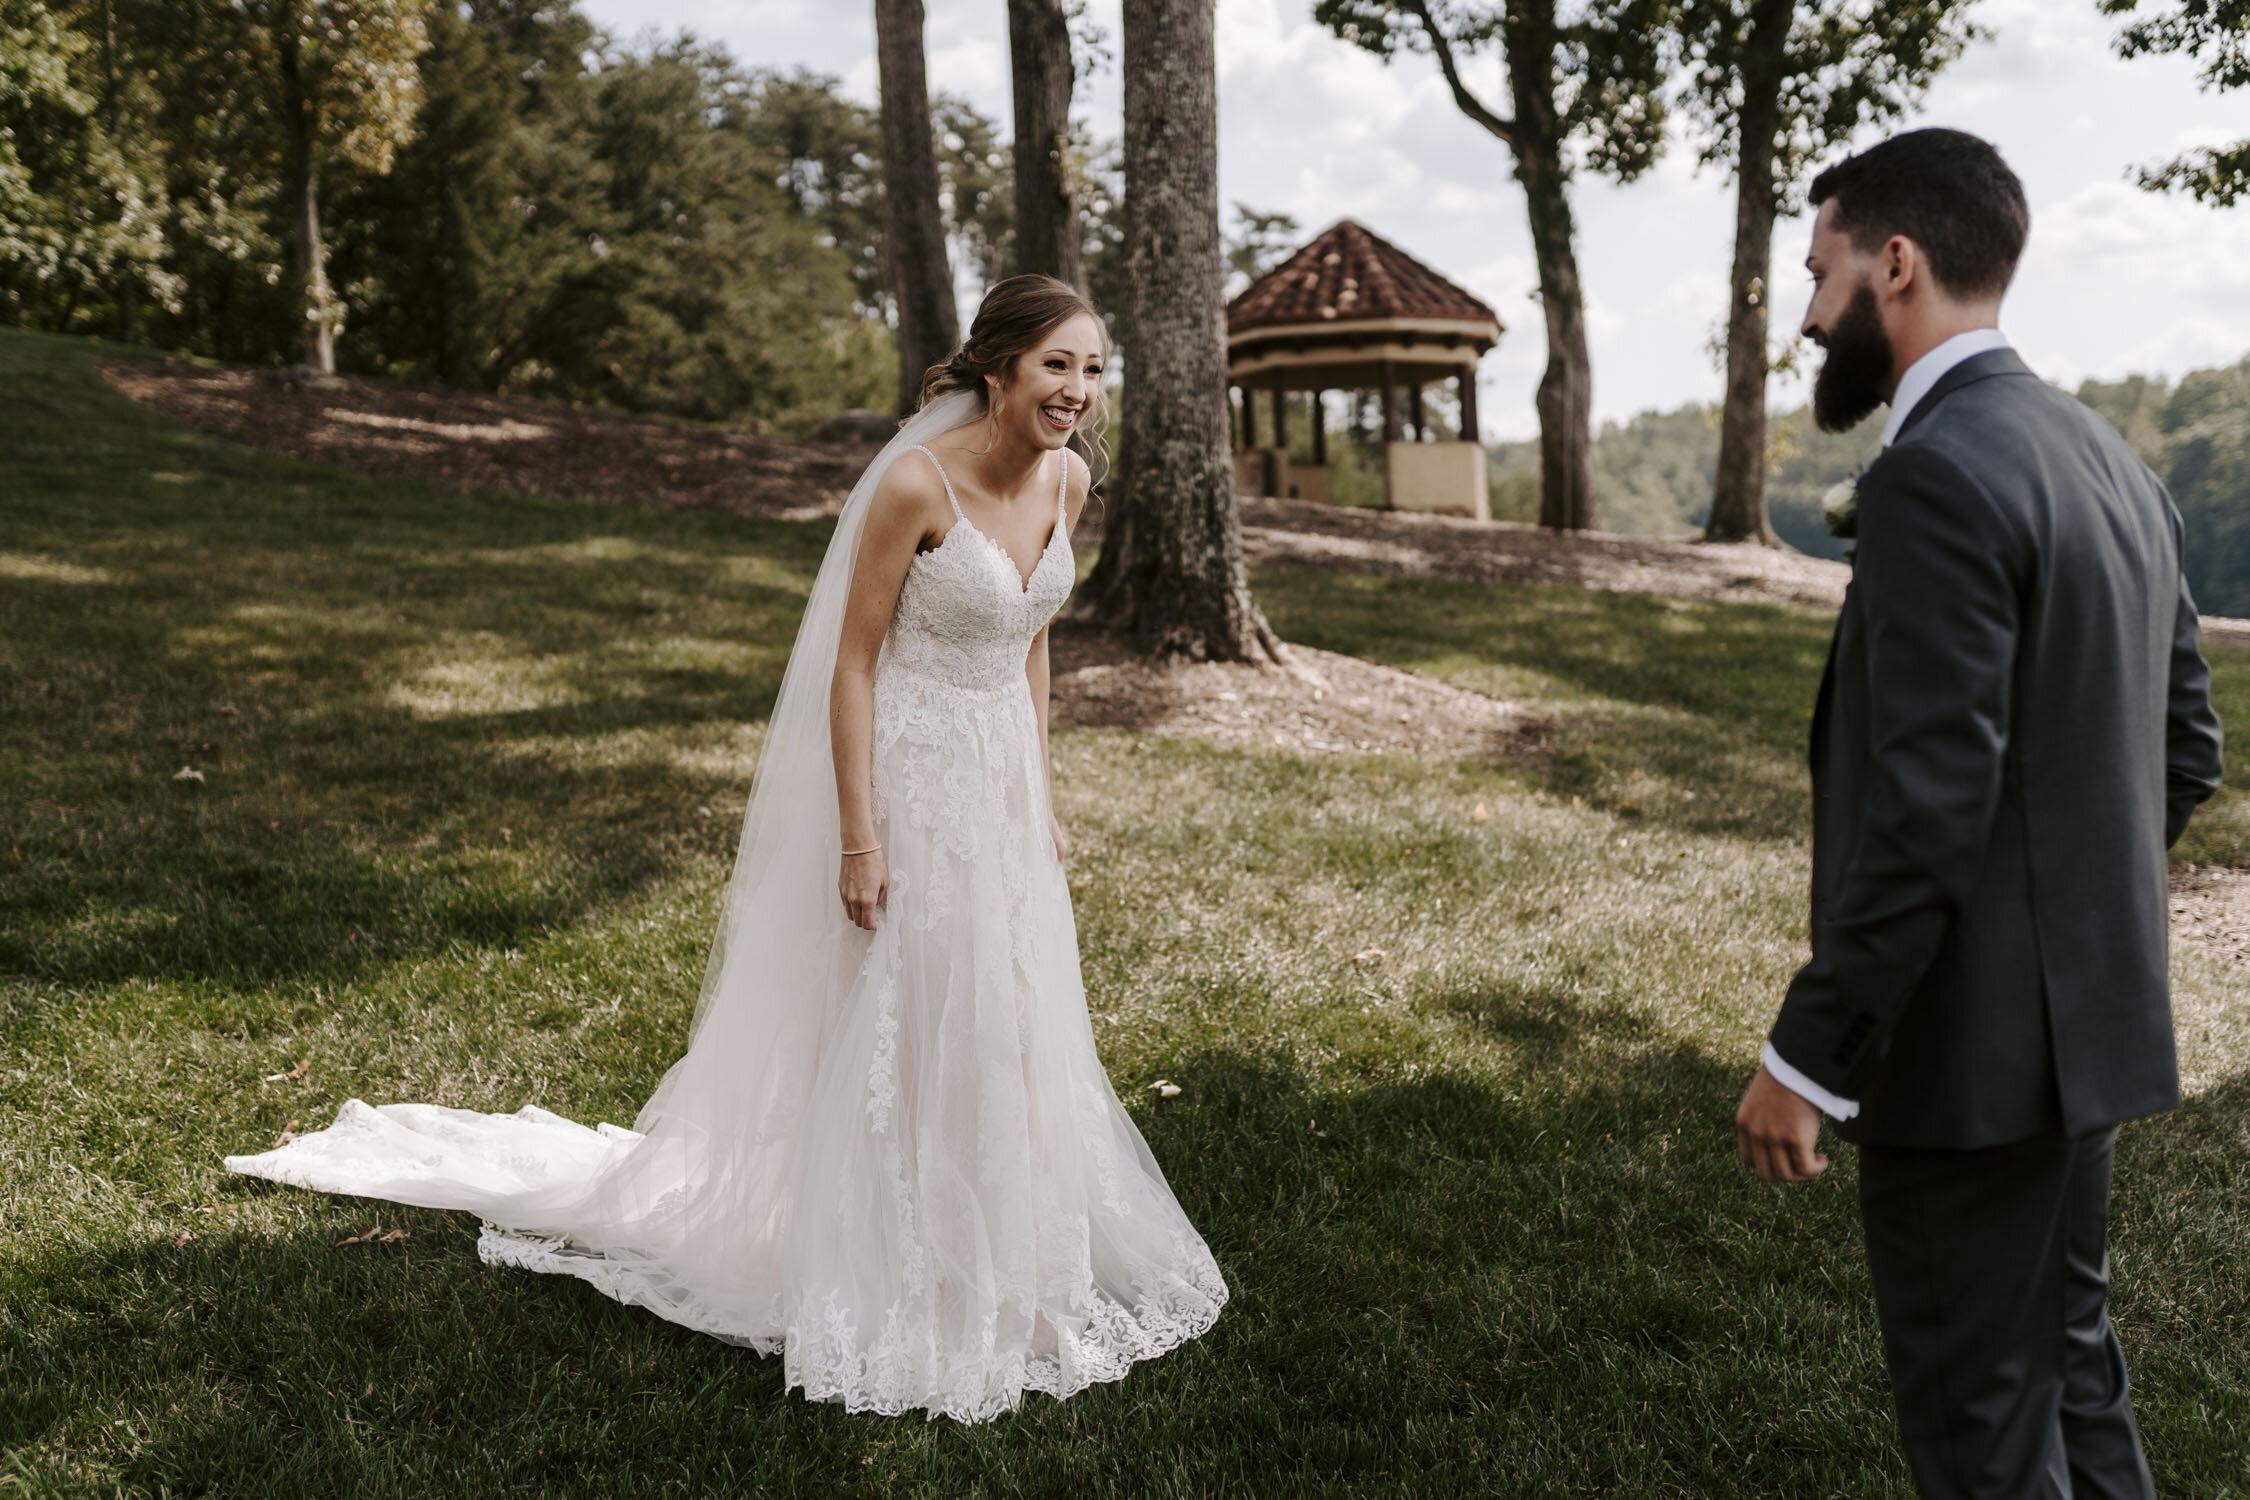 Romantic First Look at Bella Collina   By Greensboro, NC Wedding Photographer: Kayli LaFon Photography